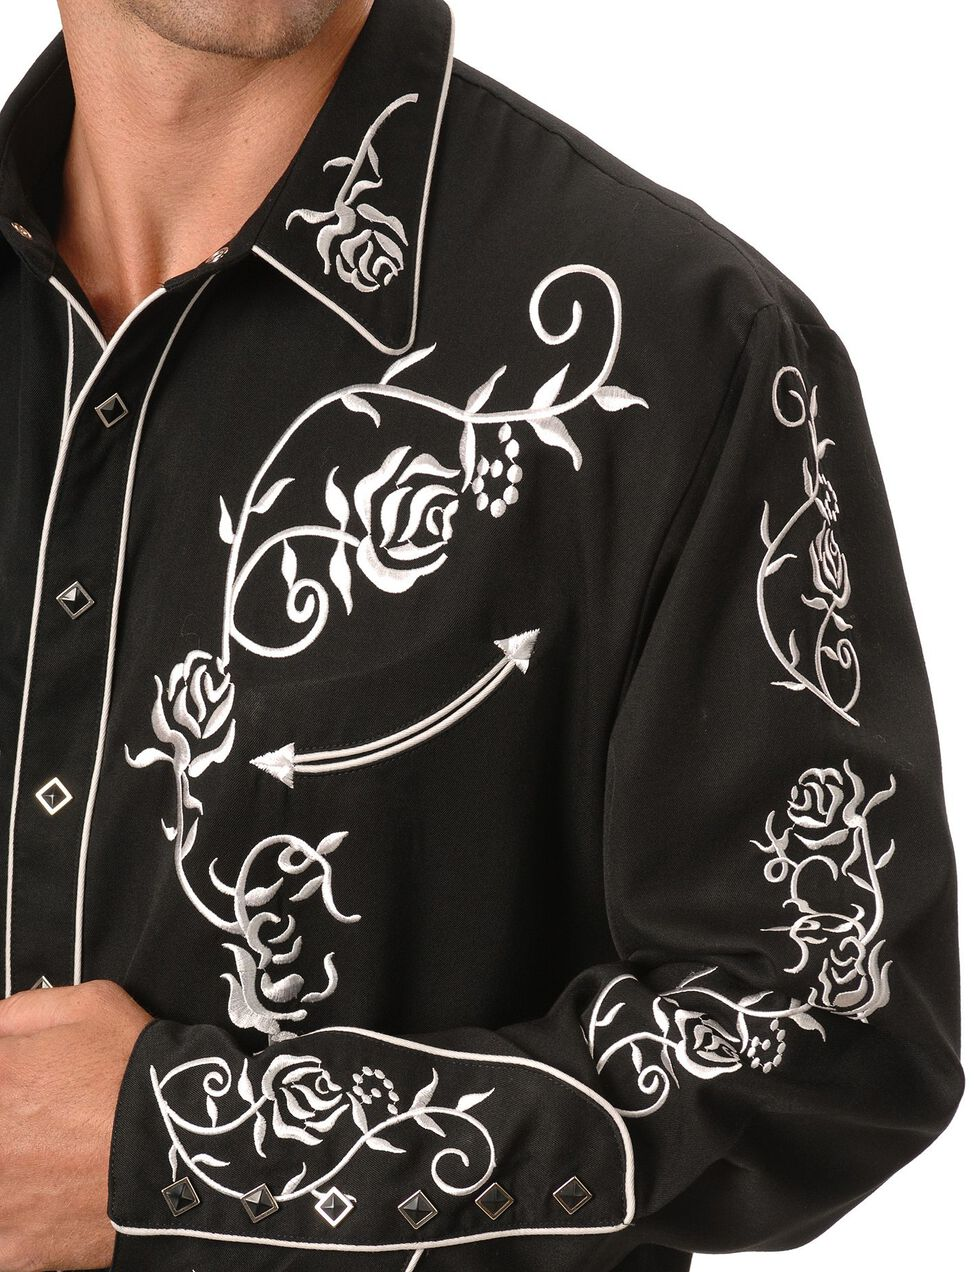 Scully Floral Embroidered Vintage Western Shirt, Black, hi-res